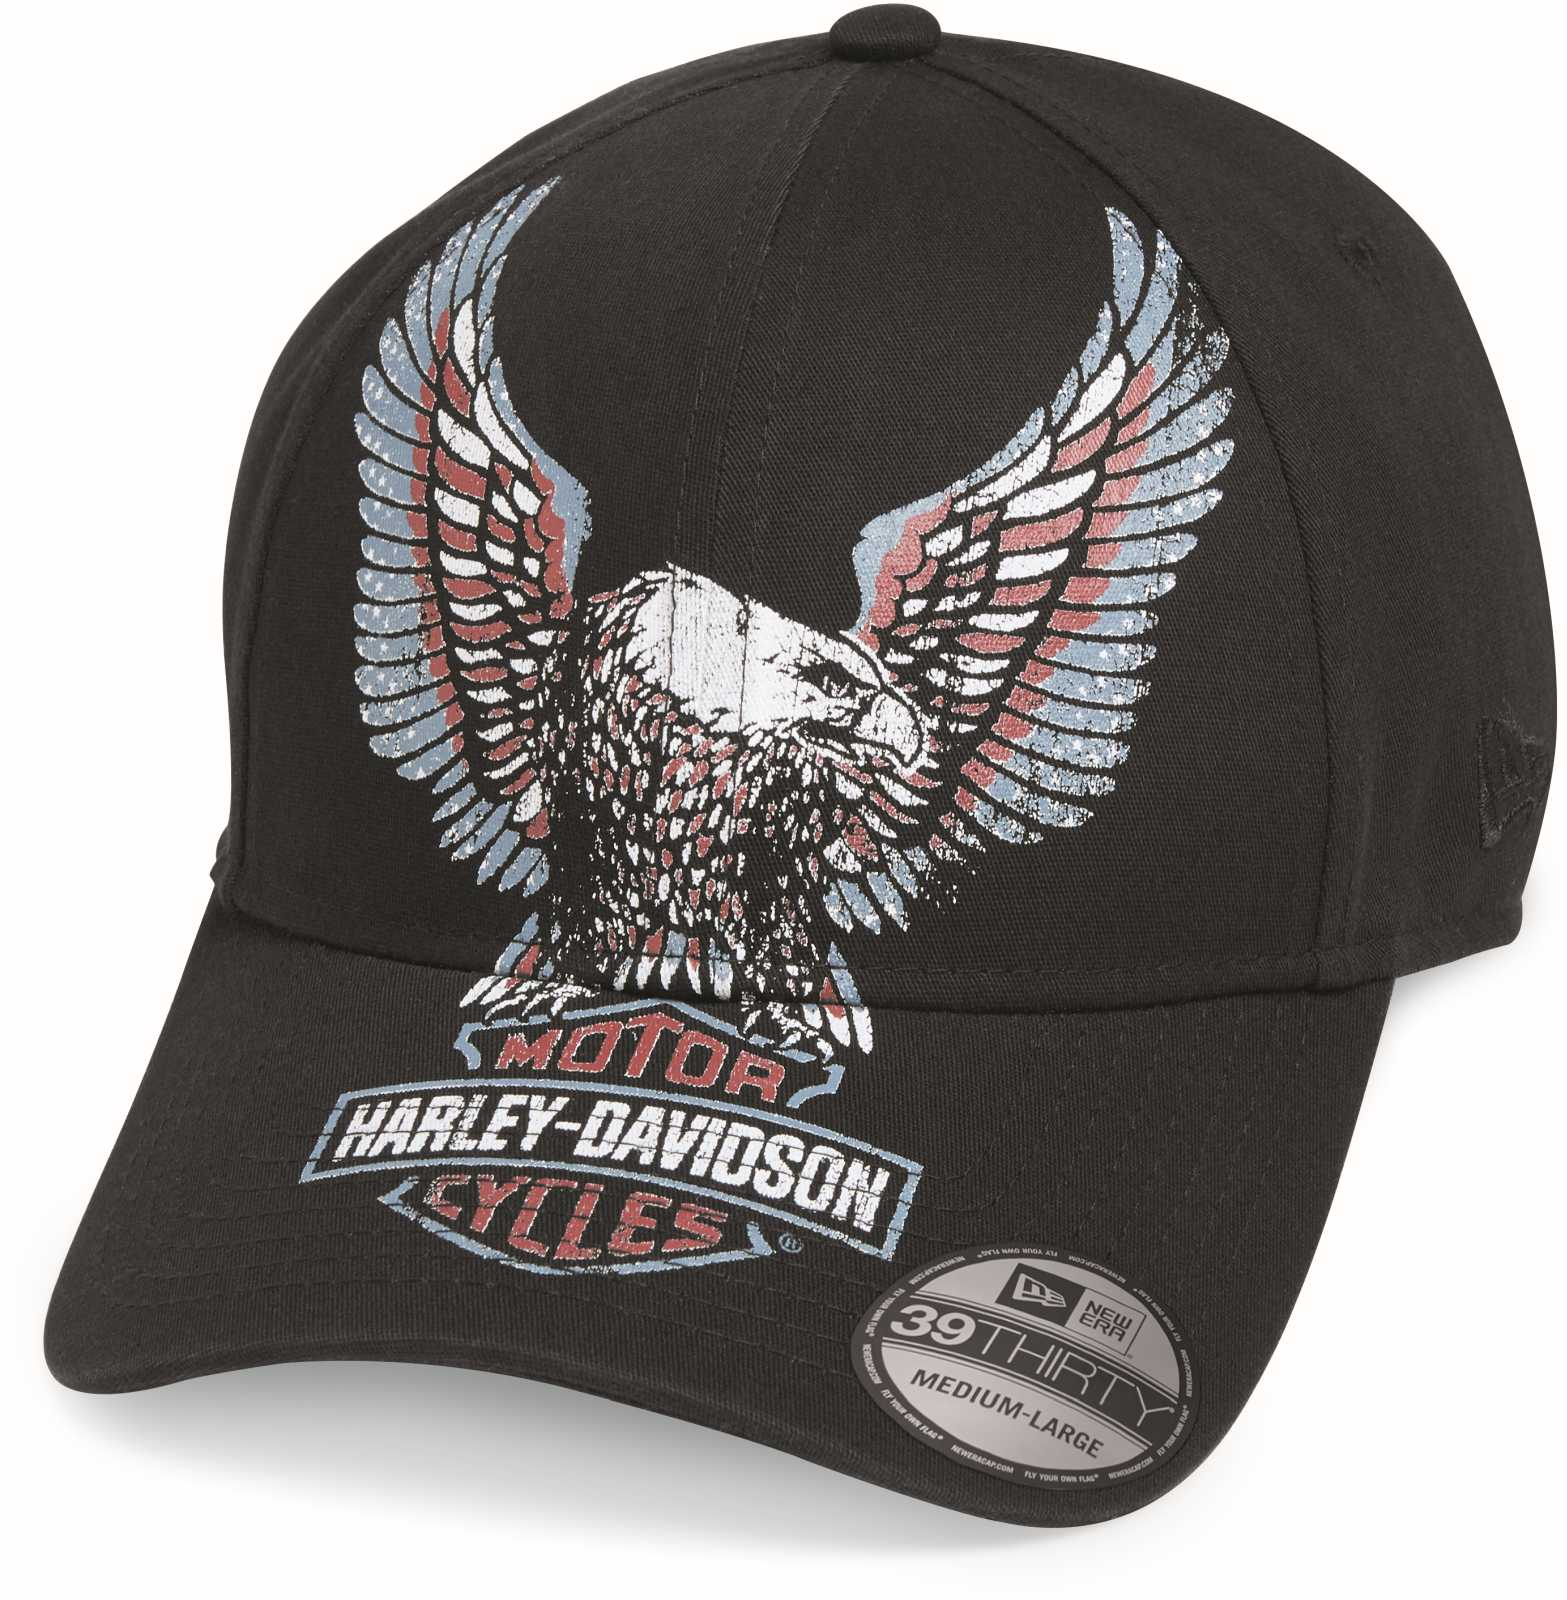 5db9c9b66a640 ... H-D Motorclothes Harley-Davidson Baseball Cap Eagle Printed -  99473-19VM ...